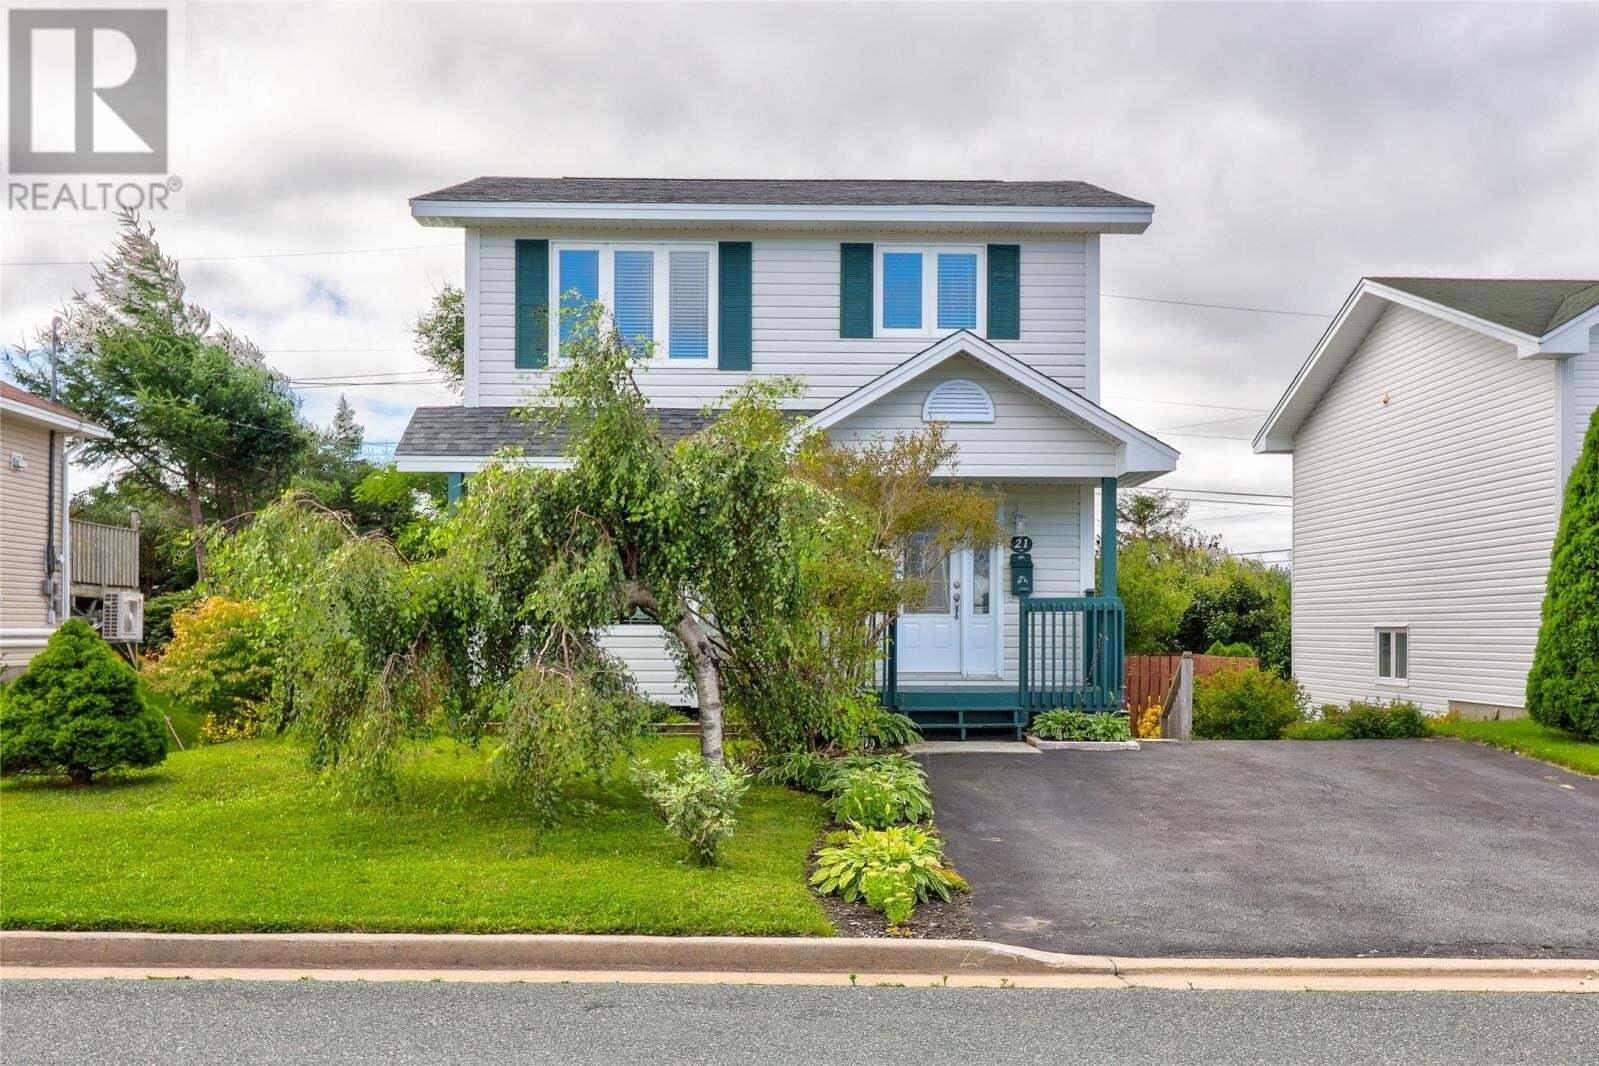 House for sale at 21 Maisonneuve Dr Mt. Pearl Newfoundland - MLS: 1220780